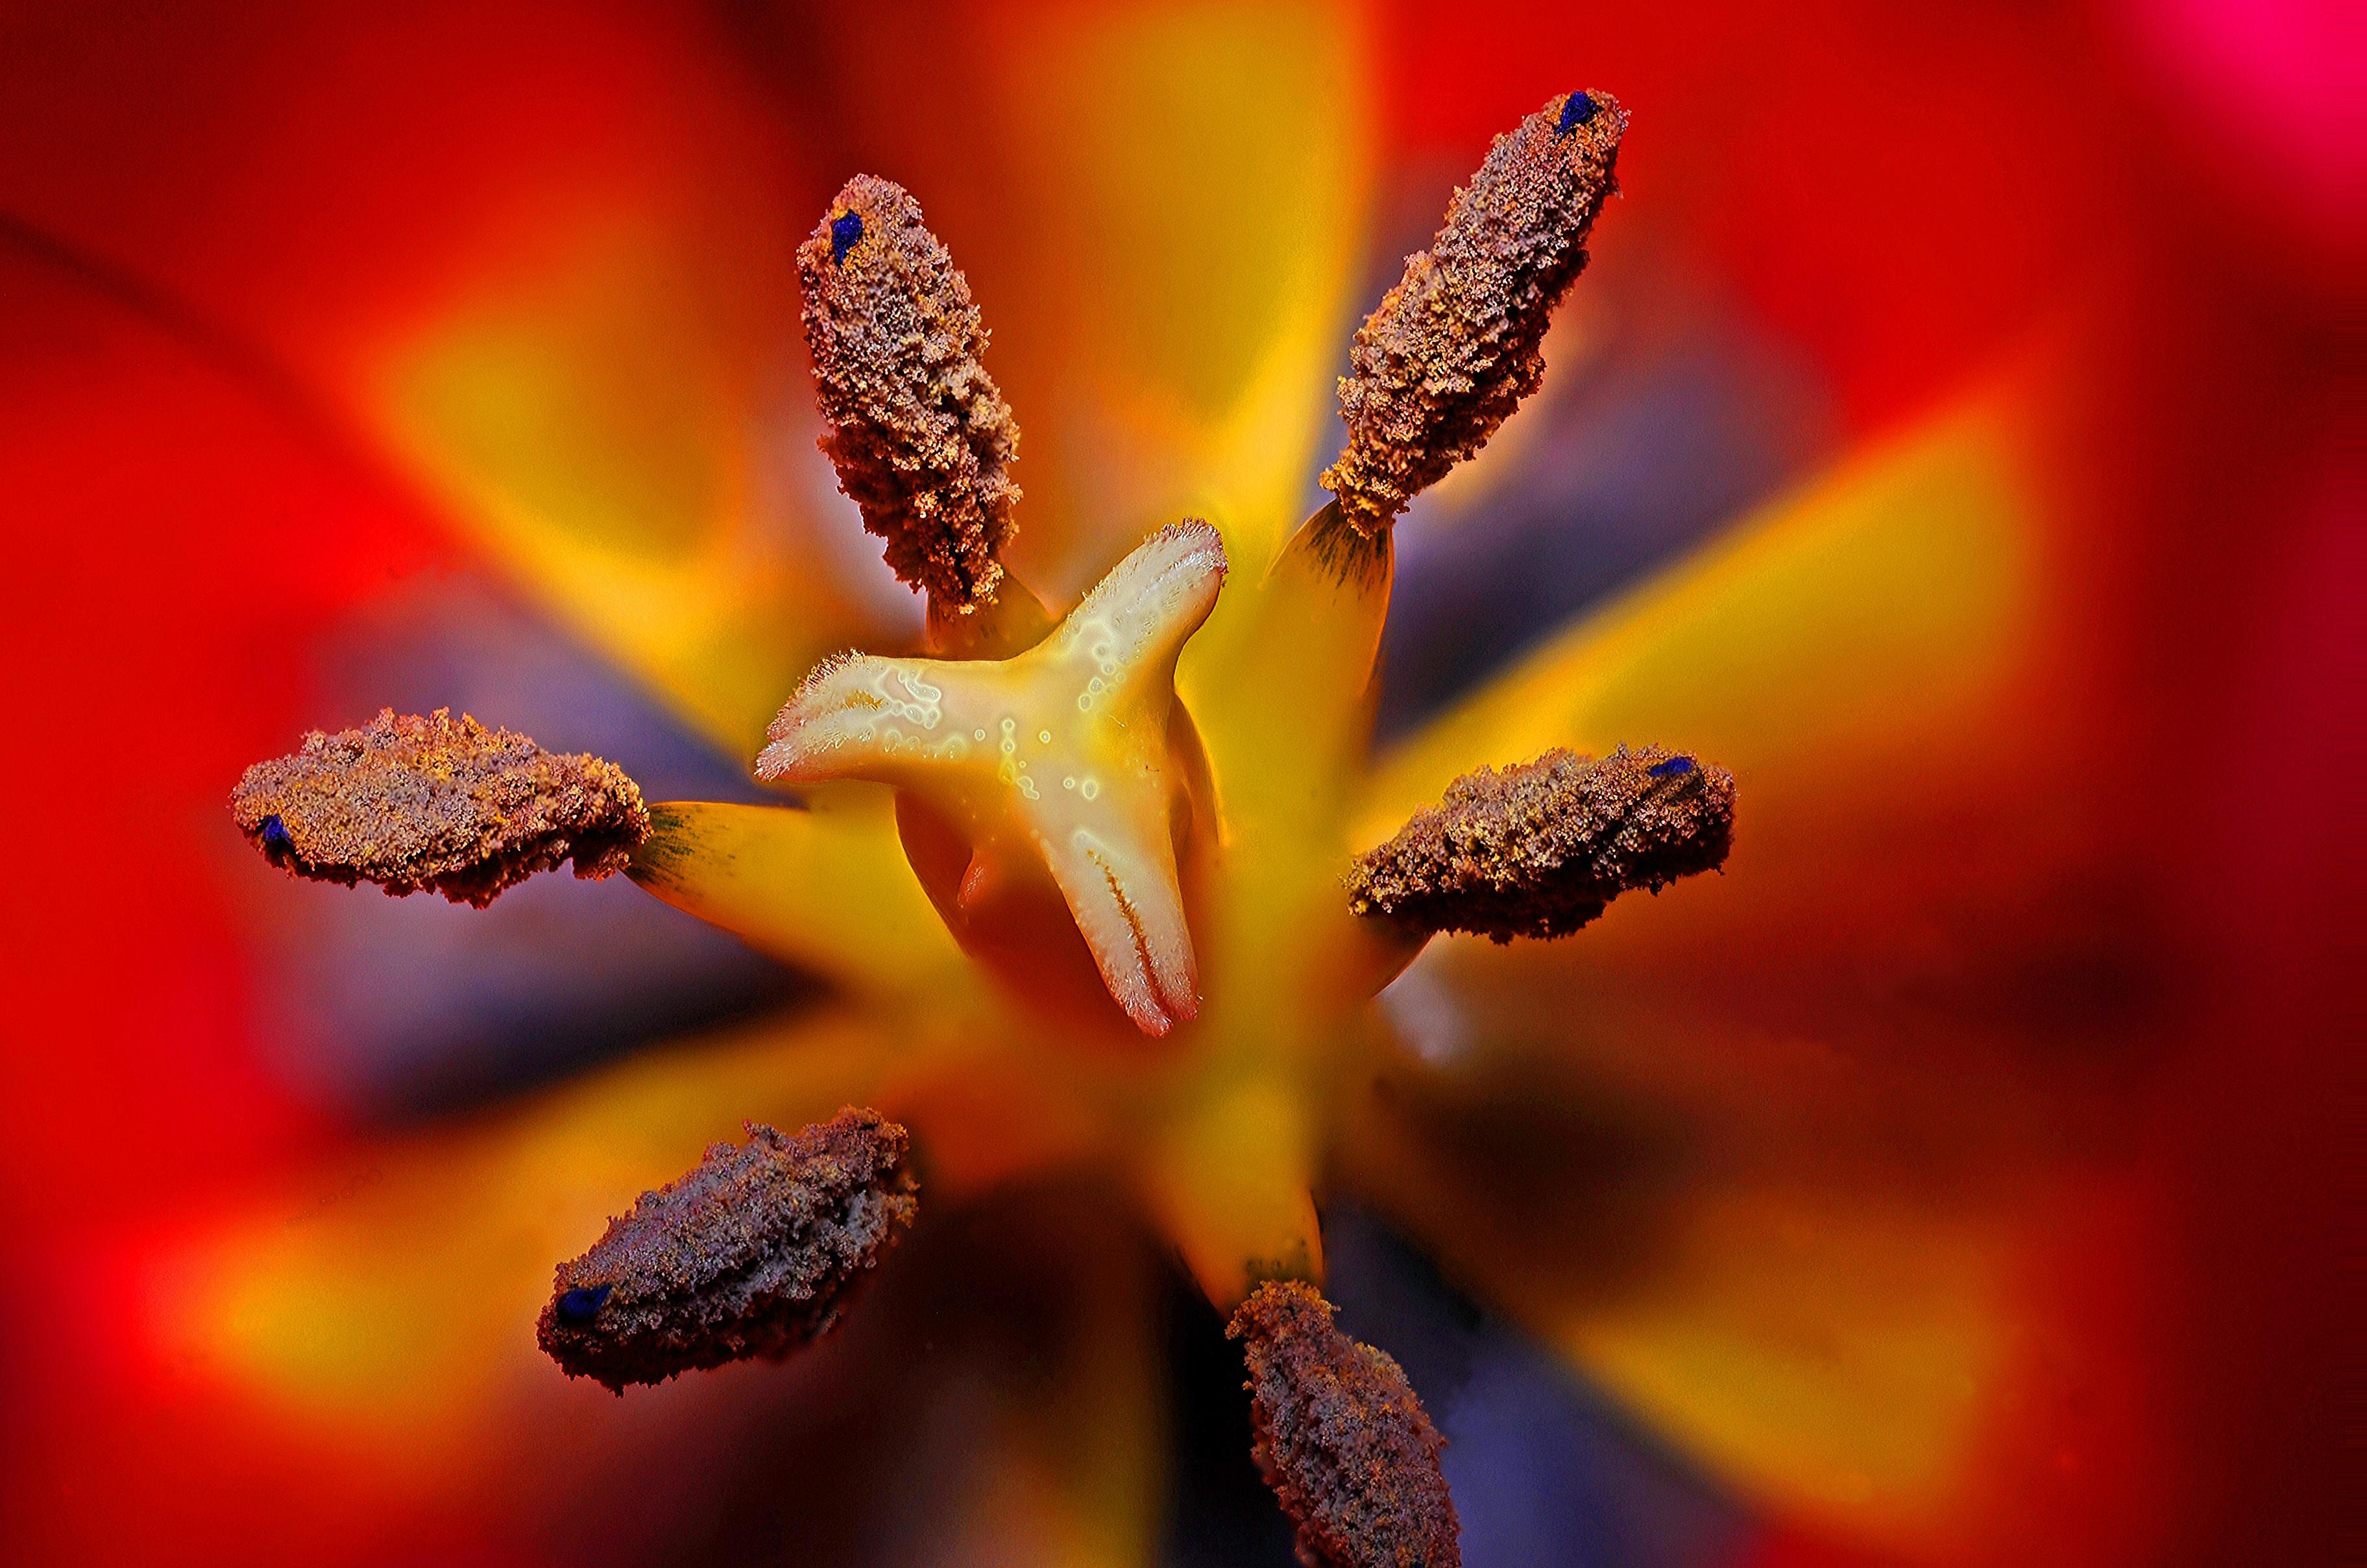 Black Floral Wallpaper Black Yellow And Red Flower Stigma In Tilt Shift Lens